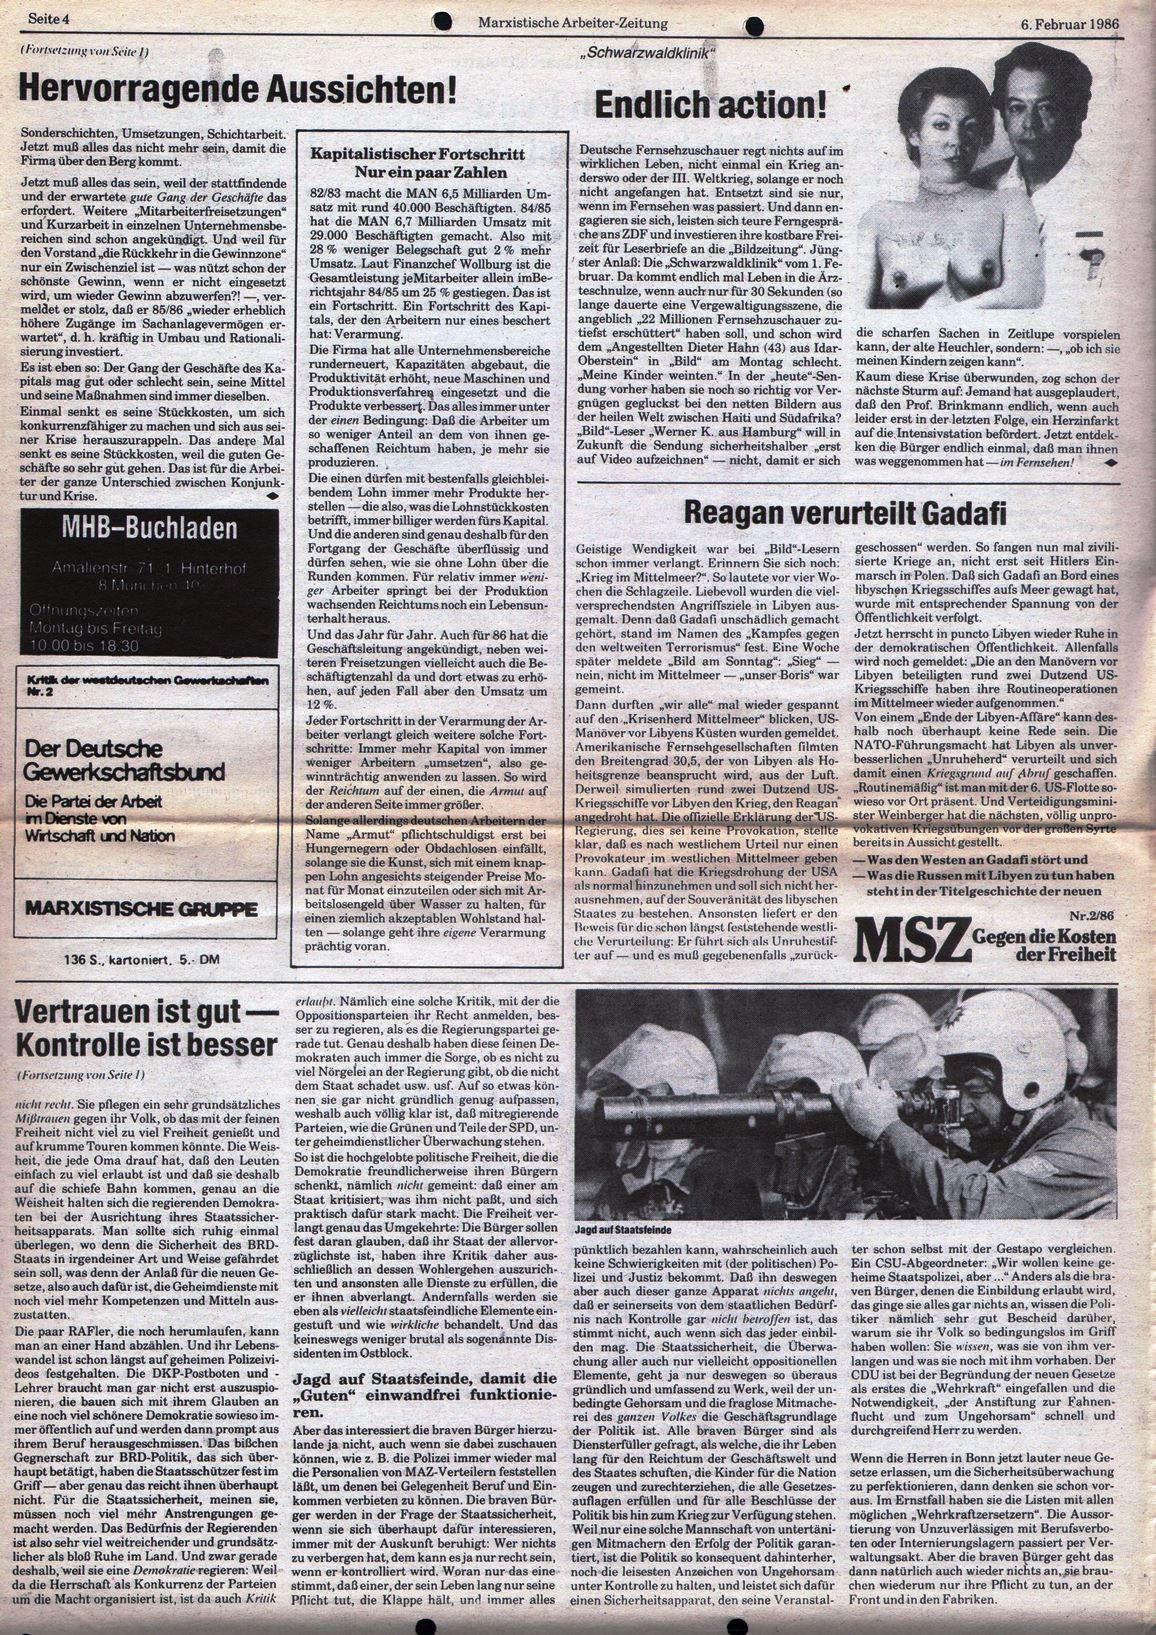 Muenchen_MG_MAZ_MAN_19860206_04